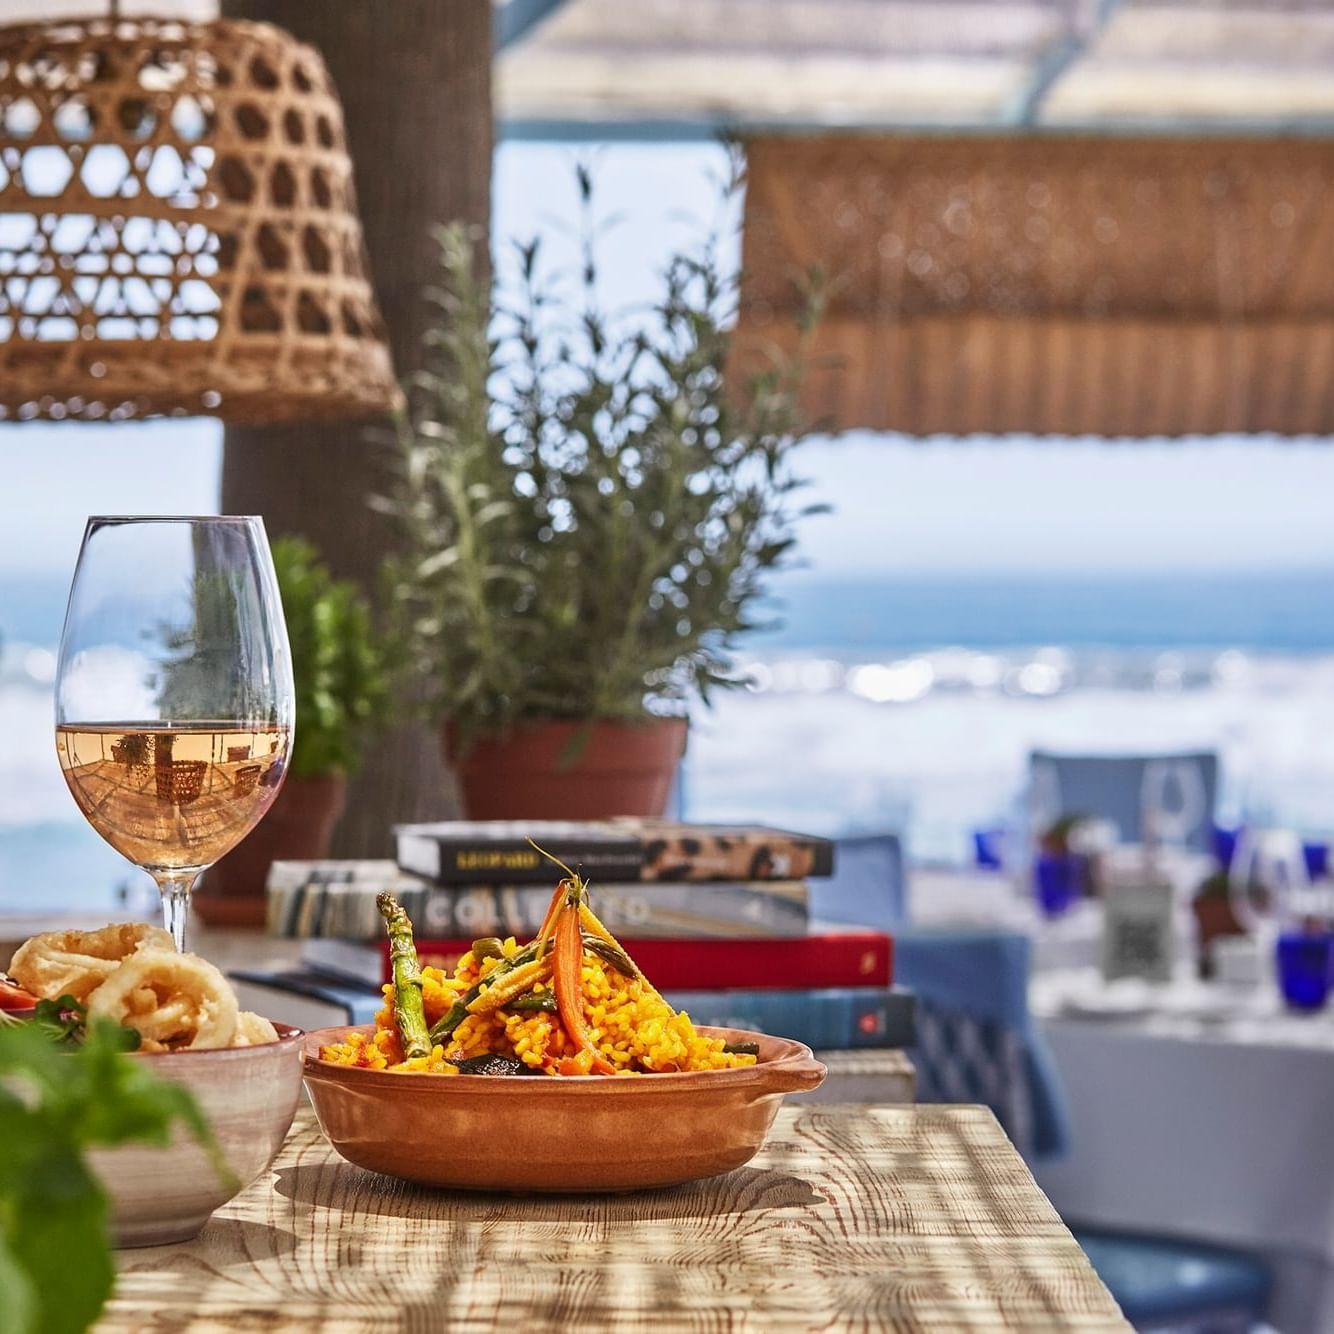 Paella masterclass at MC Beach